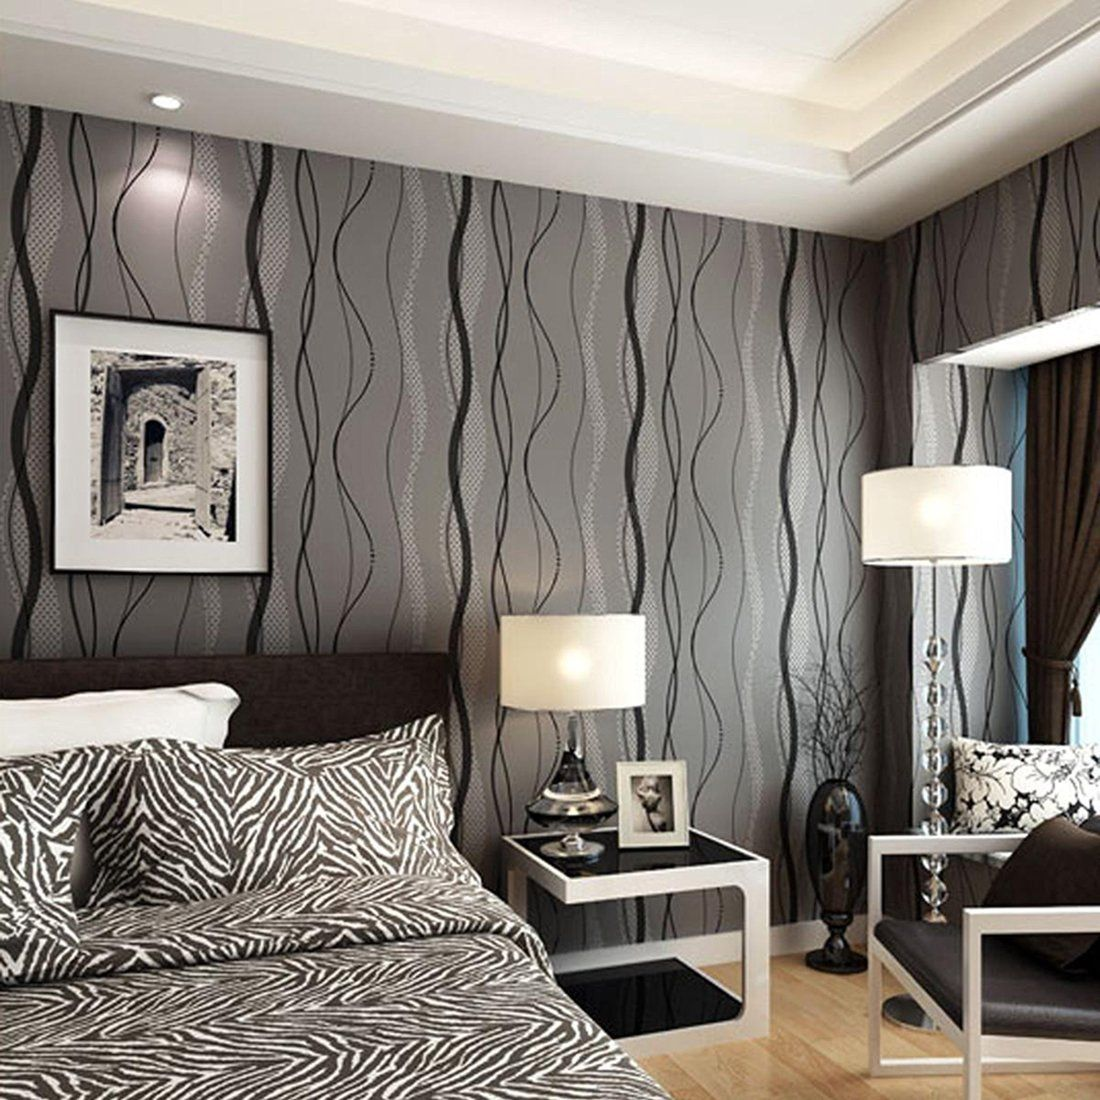 Warmiehomy 33ft Mondern Wavy Stripe Flocking Non Woven 3d Wallpaper Backdrop Decking Black Grey Amazon Co Uk Diy Bedroom Tv Wall Tv Wall Decor Tv In Bedroom